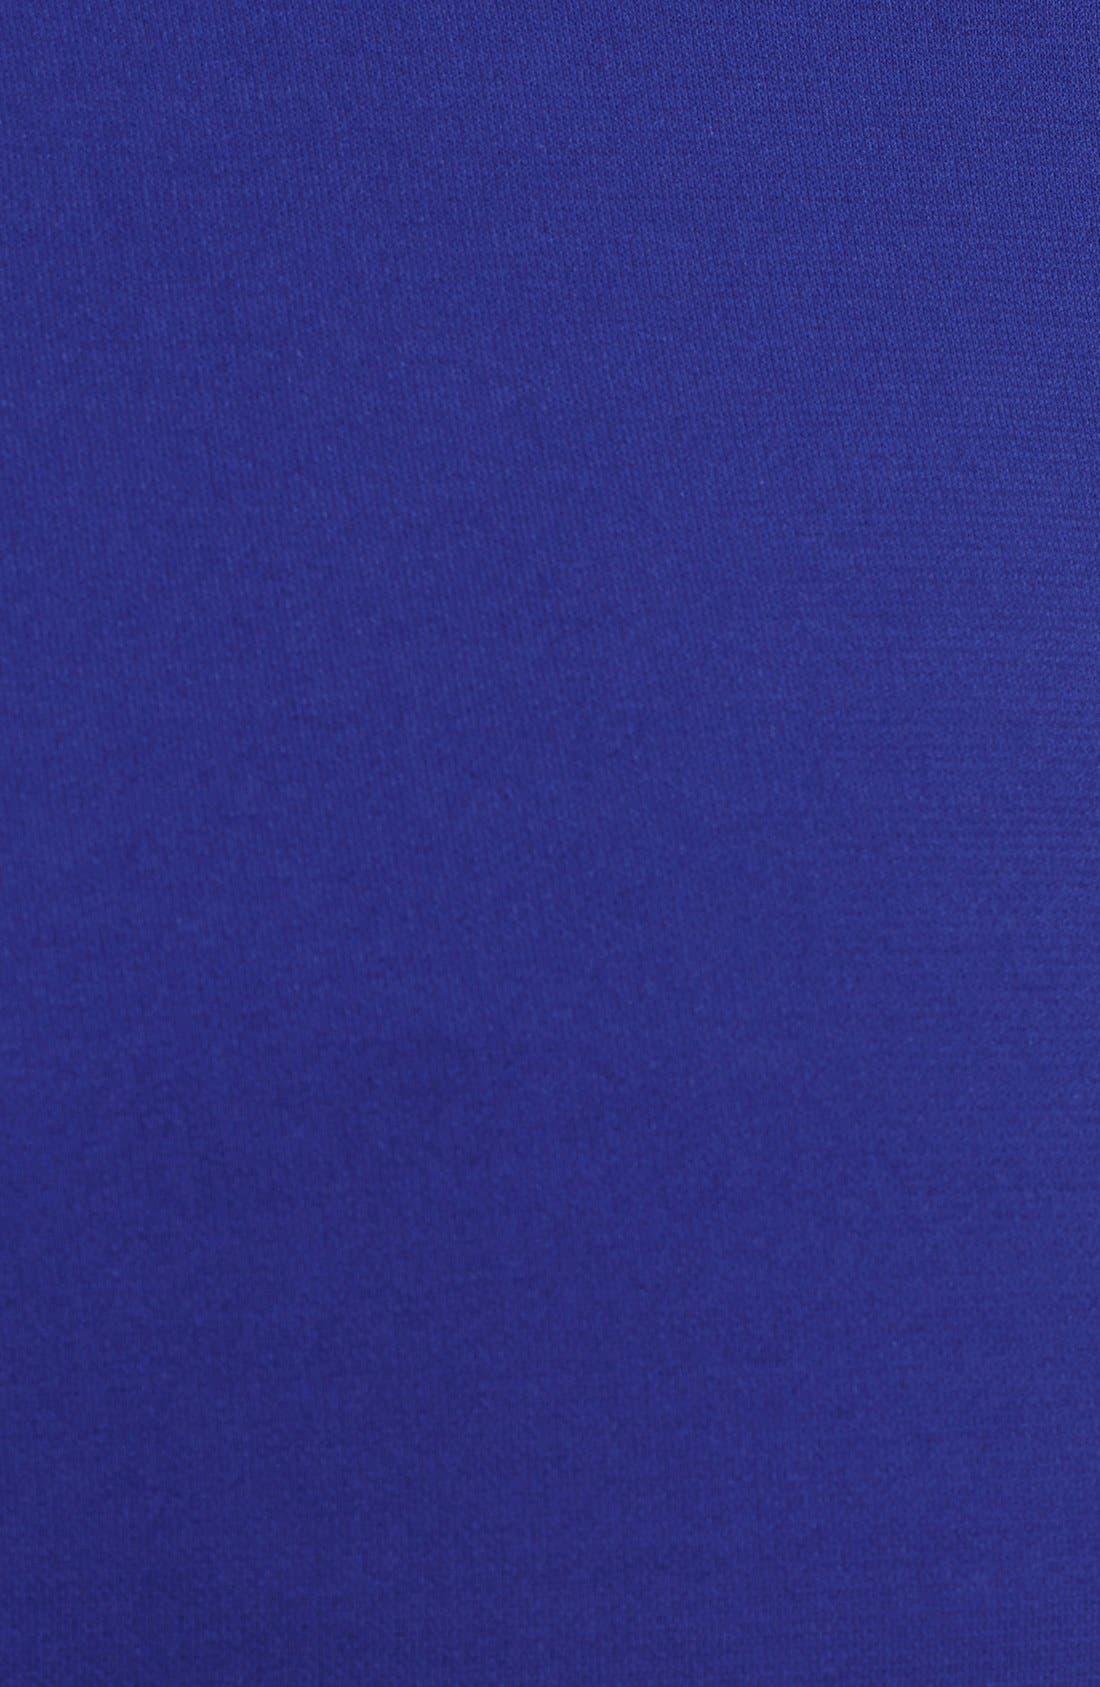 Alternate Image 3  - Max Mara 'Nave' Jersey Pants